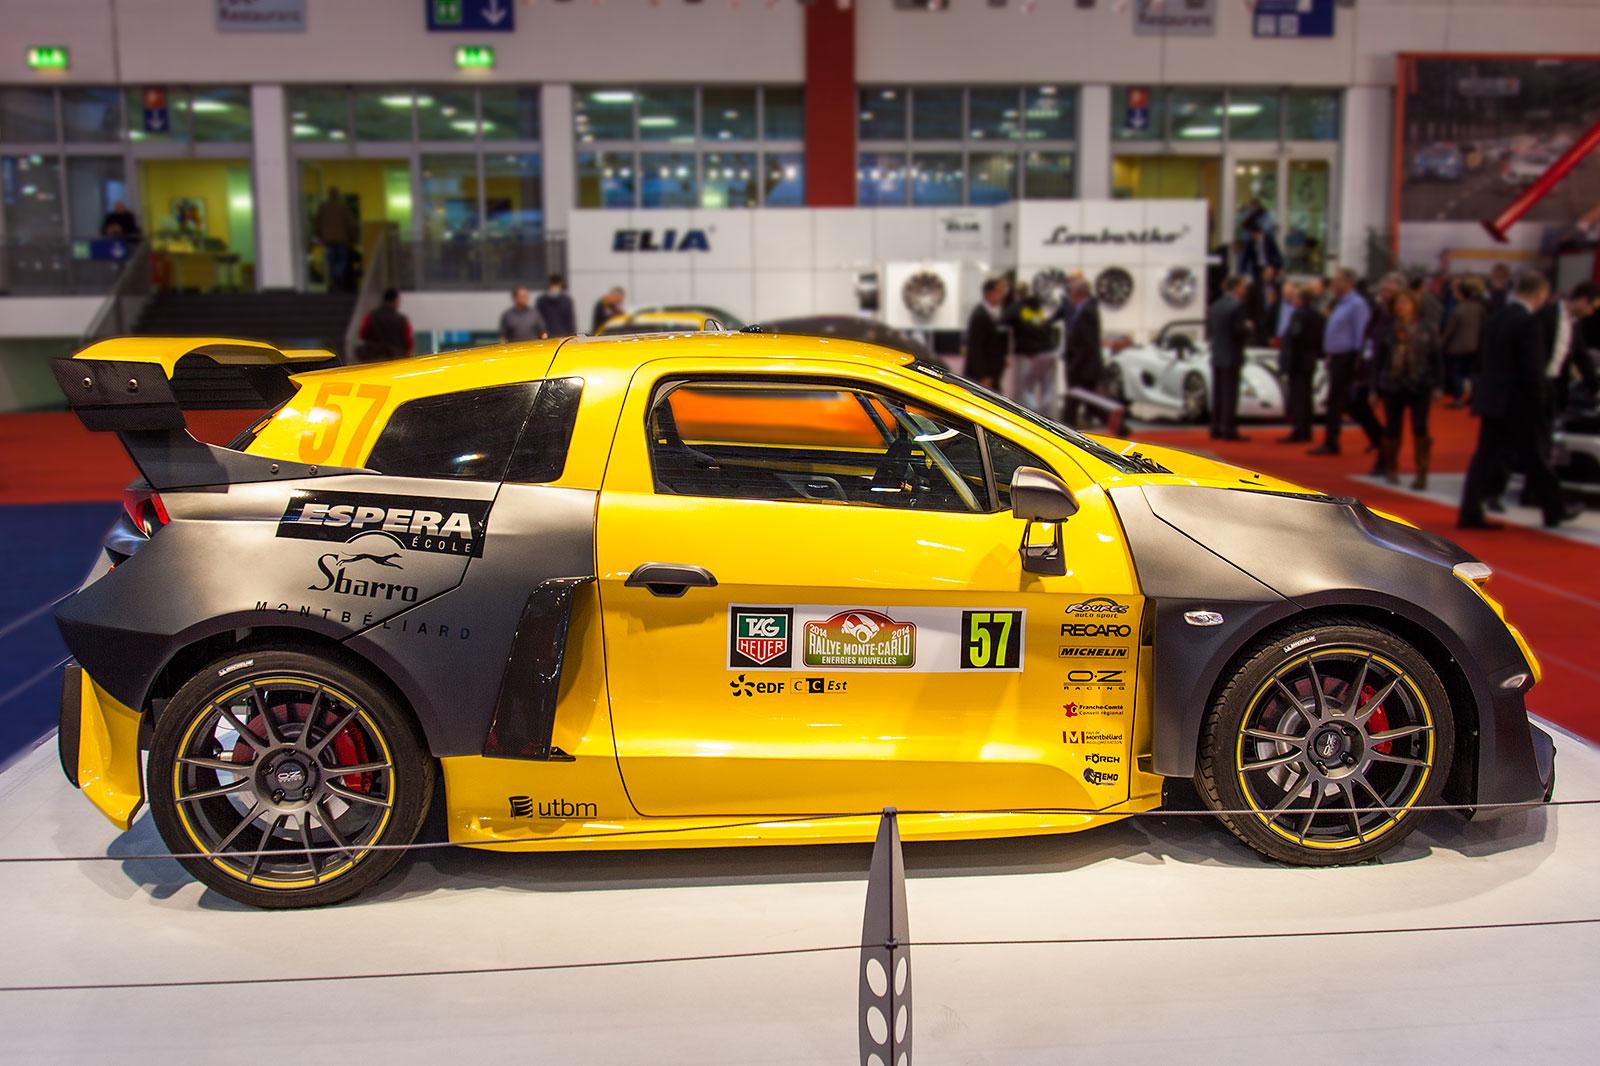 foto sbarro espera ibride sparta hybrid rallye auto essen motor show 2014 vergr ert. Black Bedroom Furniture Sets. Home Design Ideas